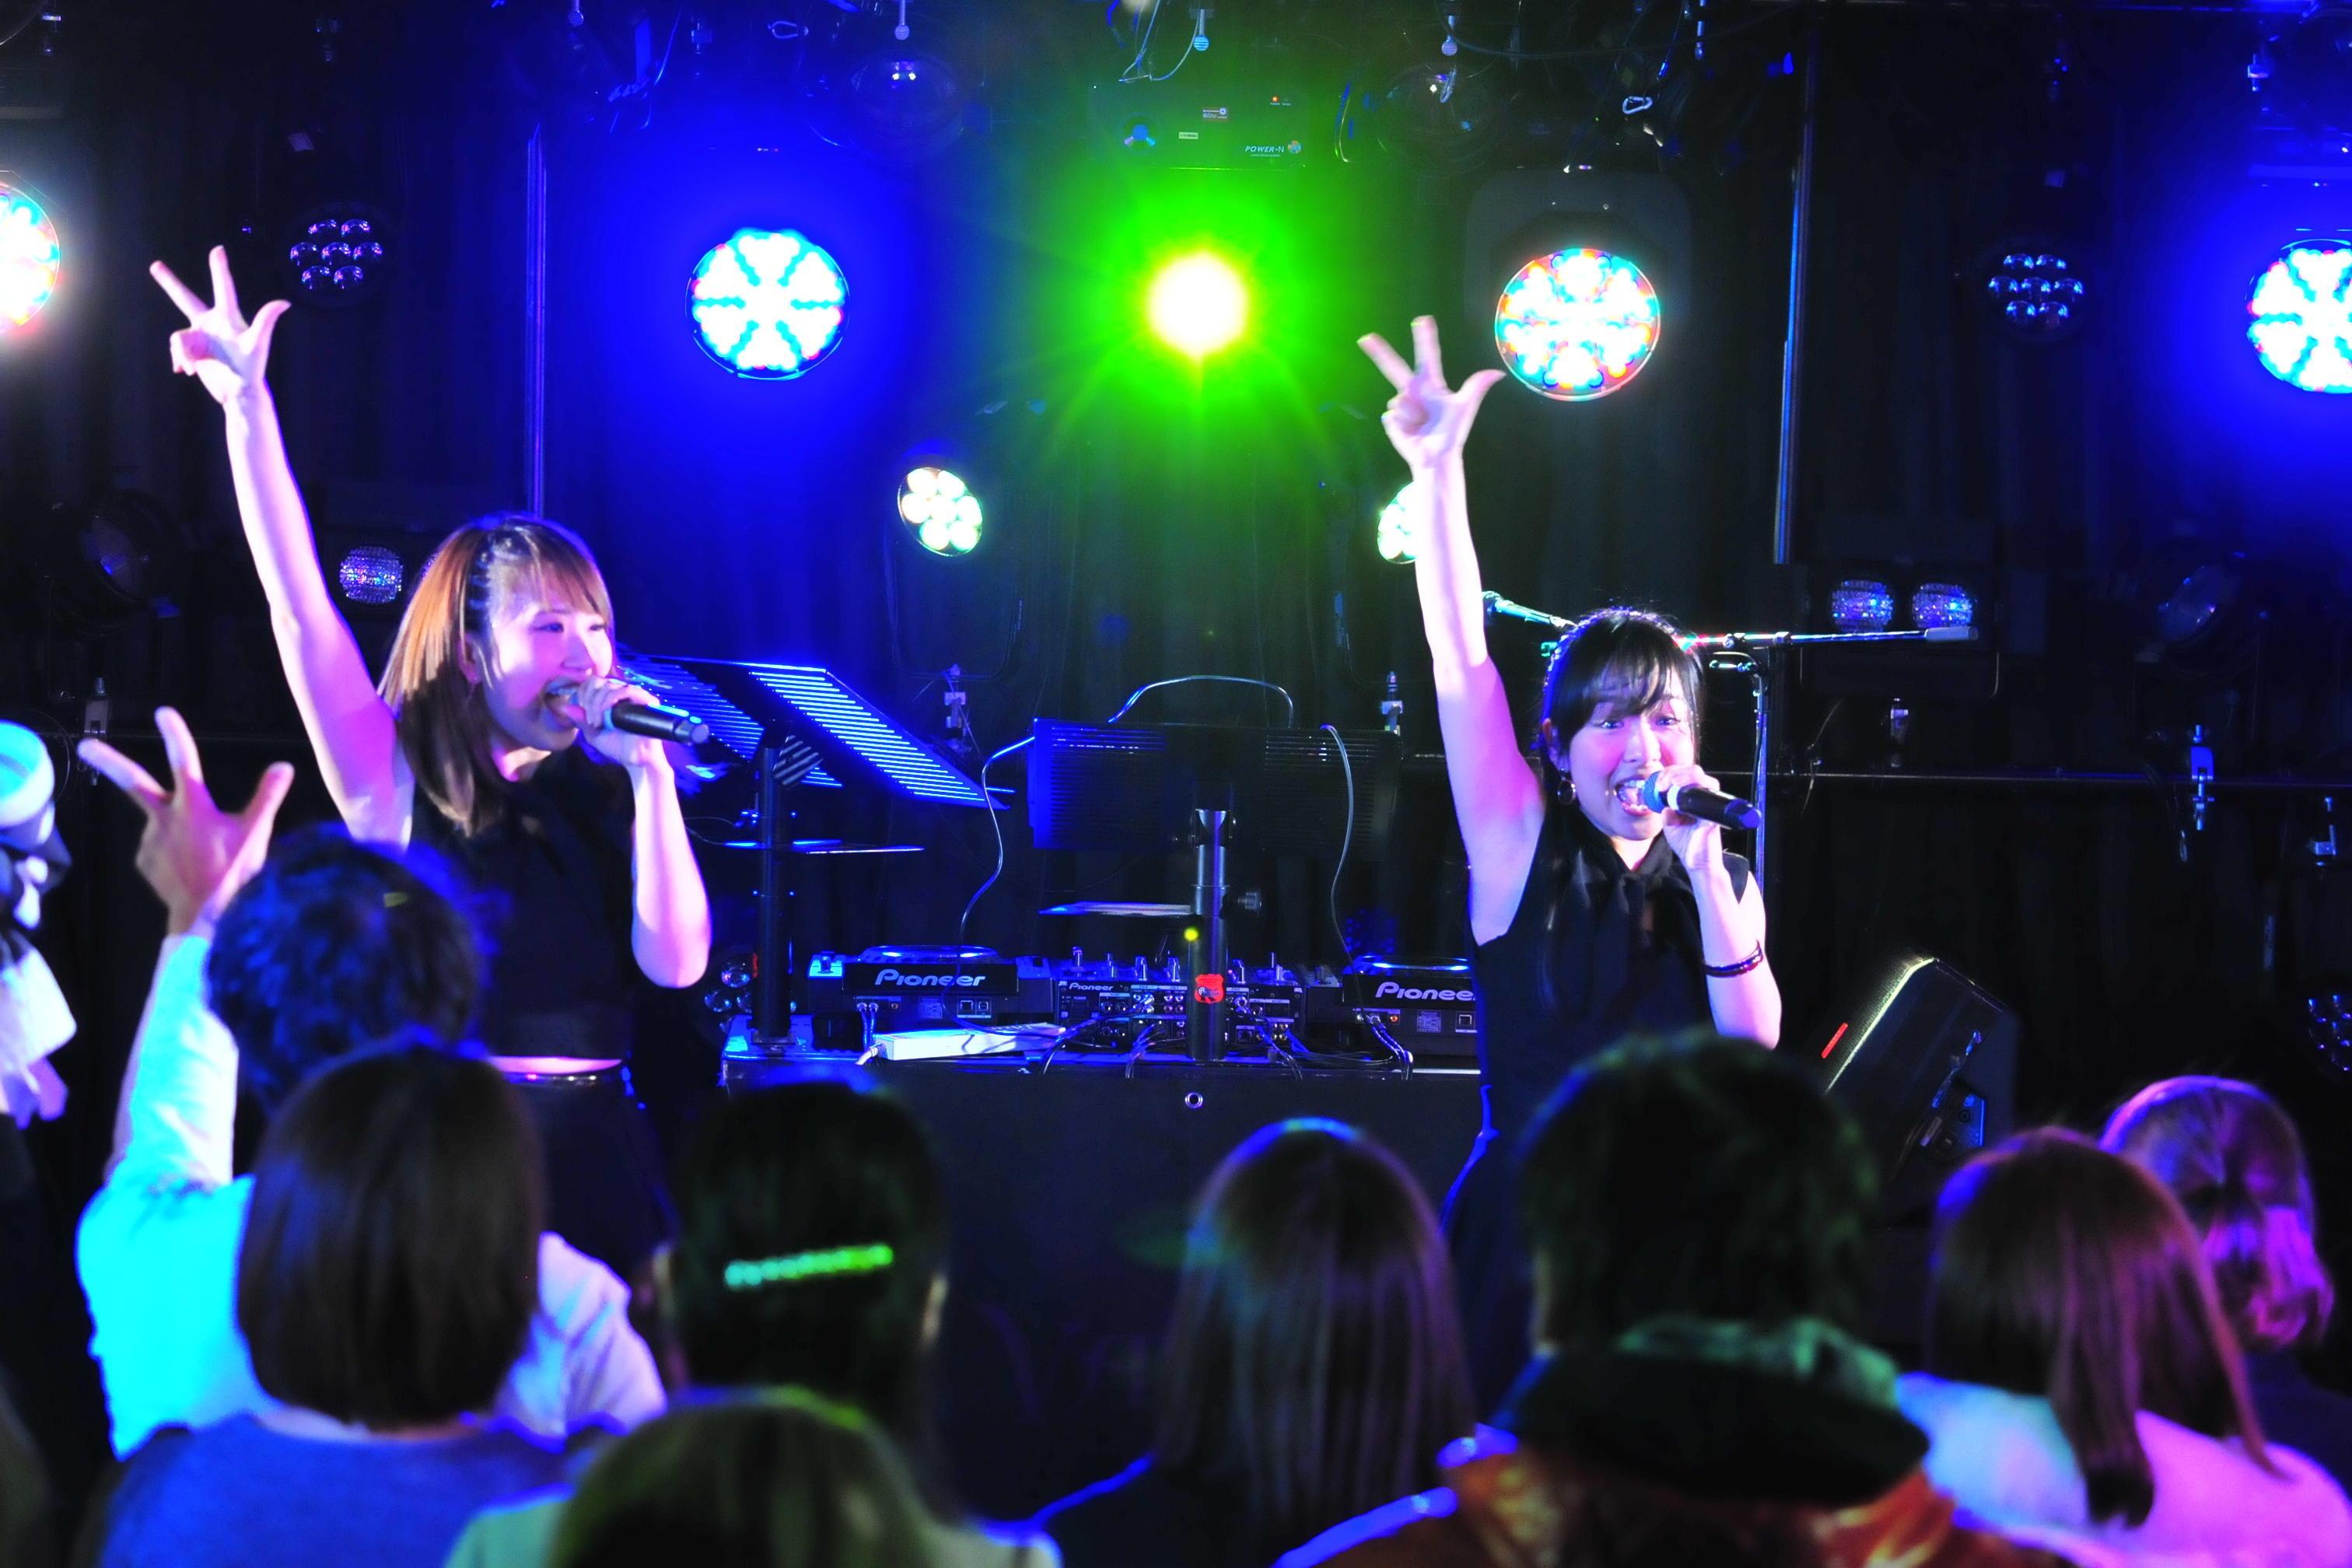 http://news.yoshimoto.co.jp/20170125191955-85696405b886e943184993481d847e8a02ba86fe.jpg